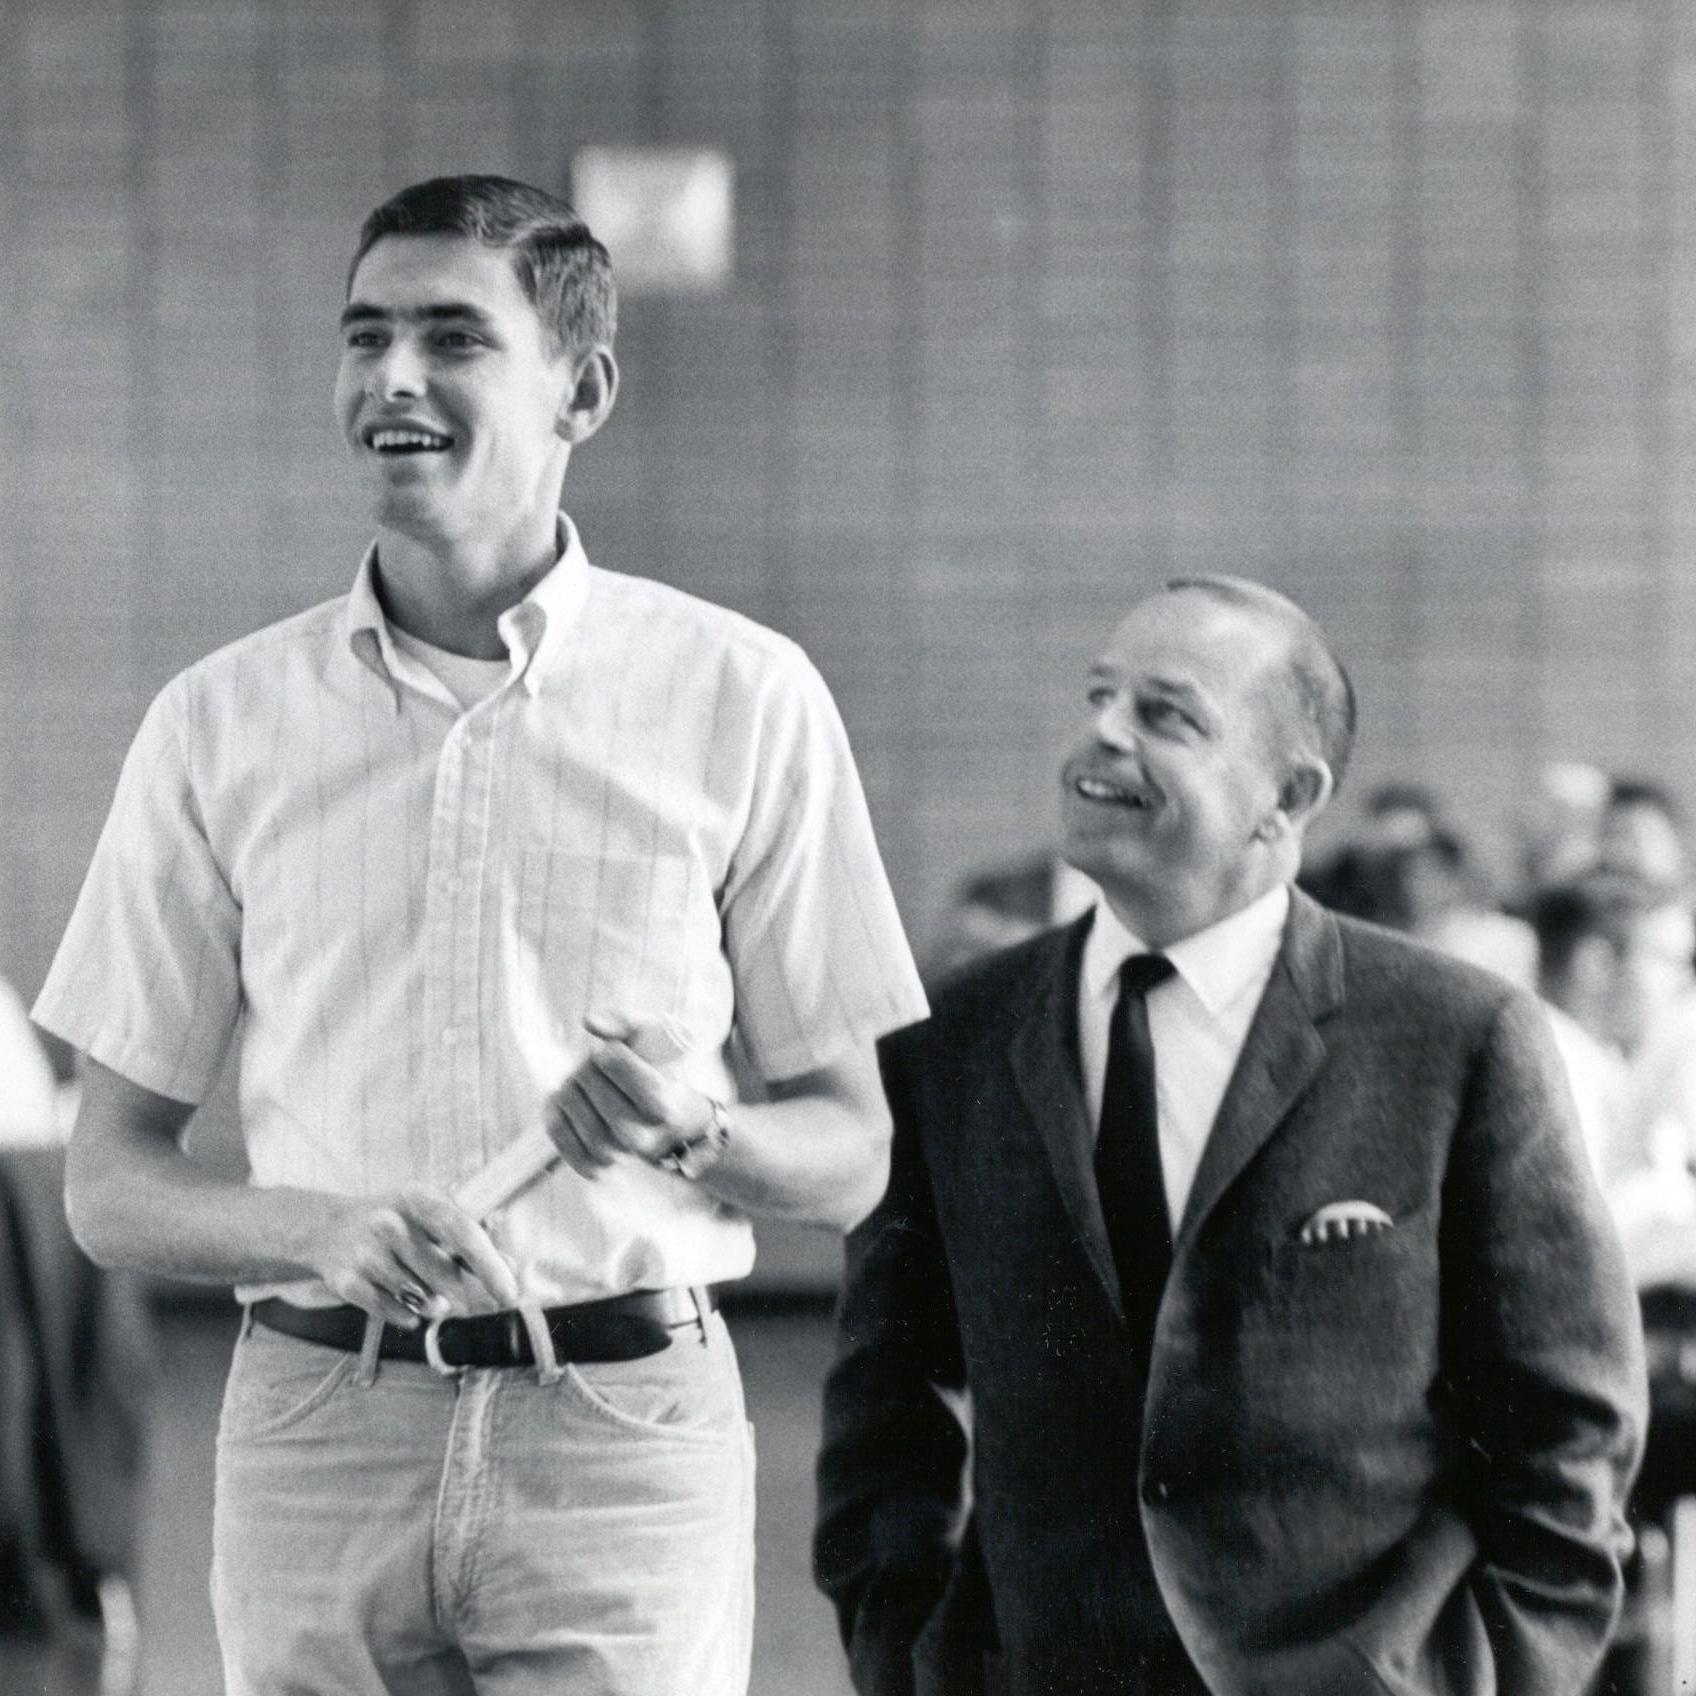 Jim Ryun and his coach, Bob Timmons.